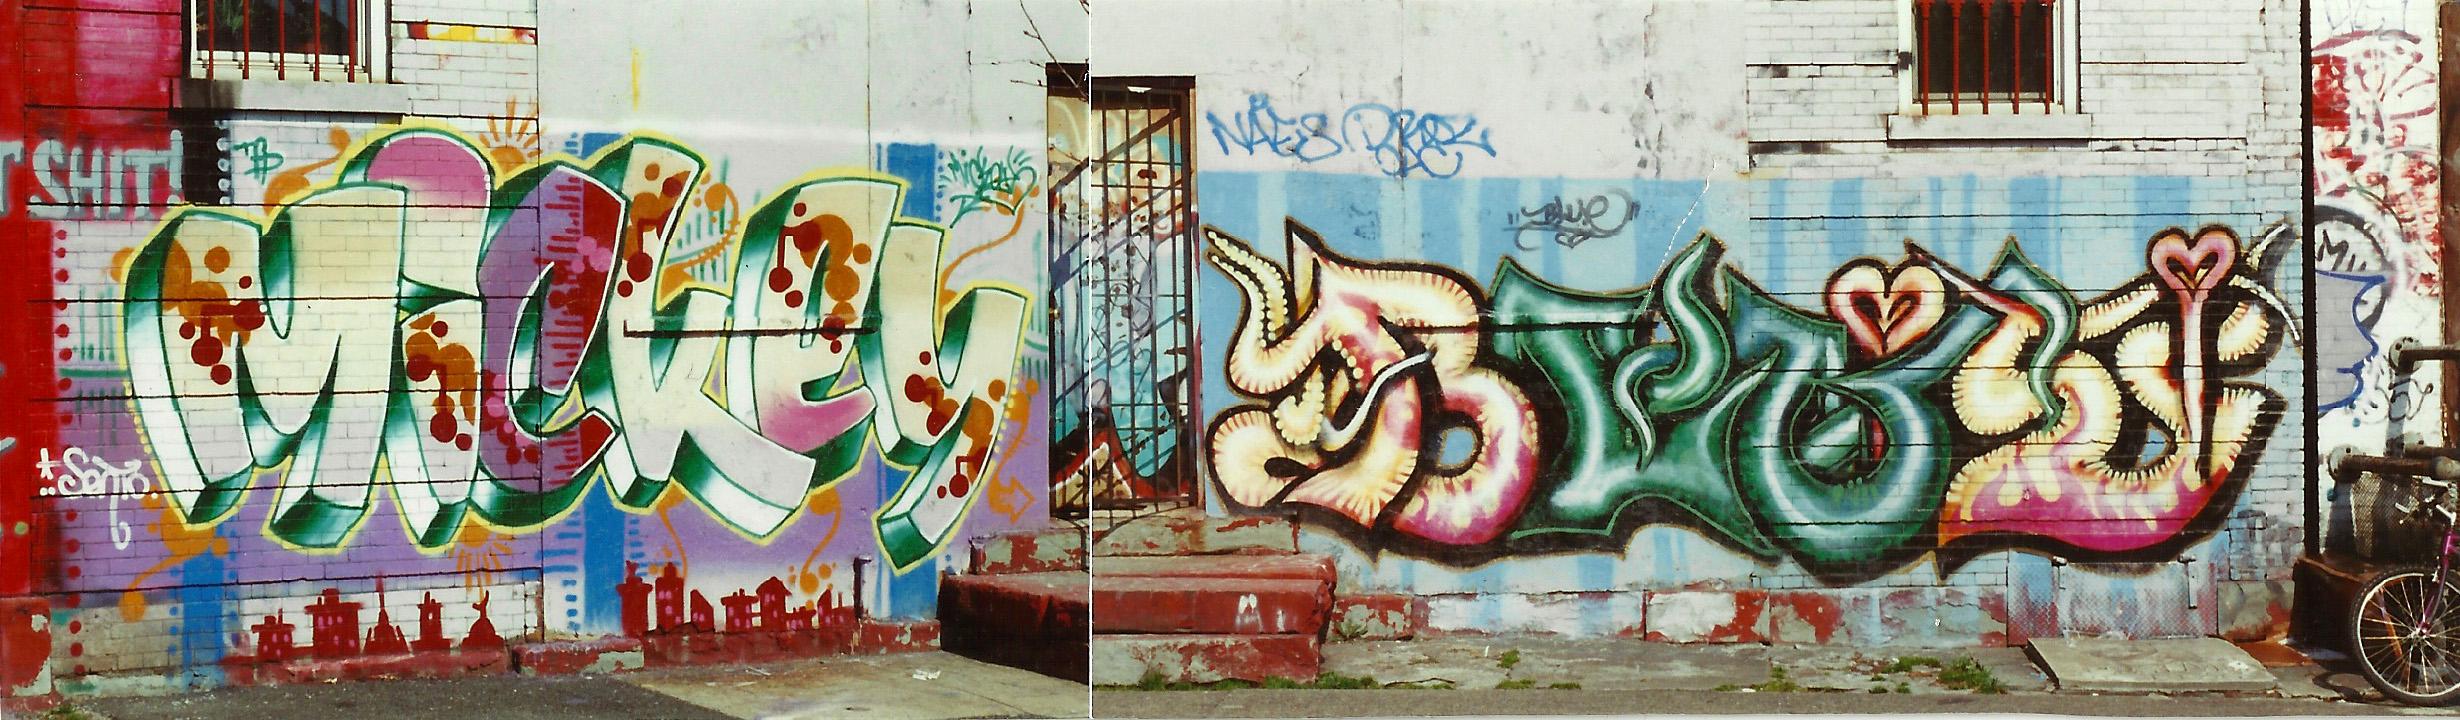 Brooklyn 1999  Mickey - Blue a.k.a.  Carolina Falkholt